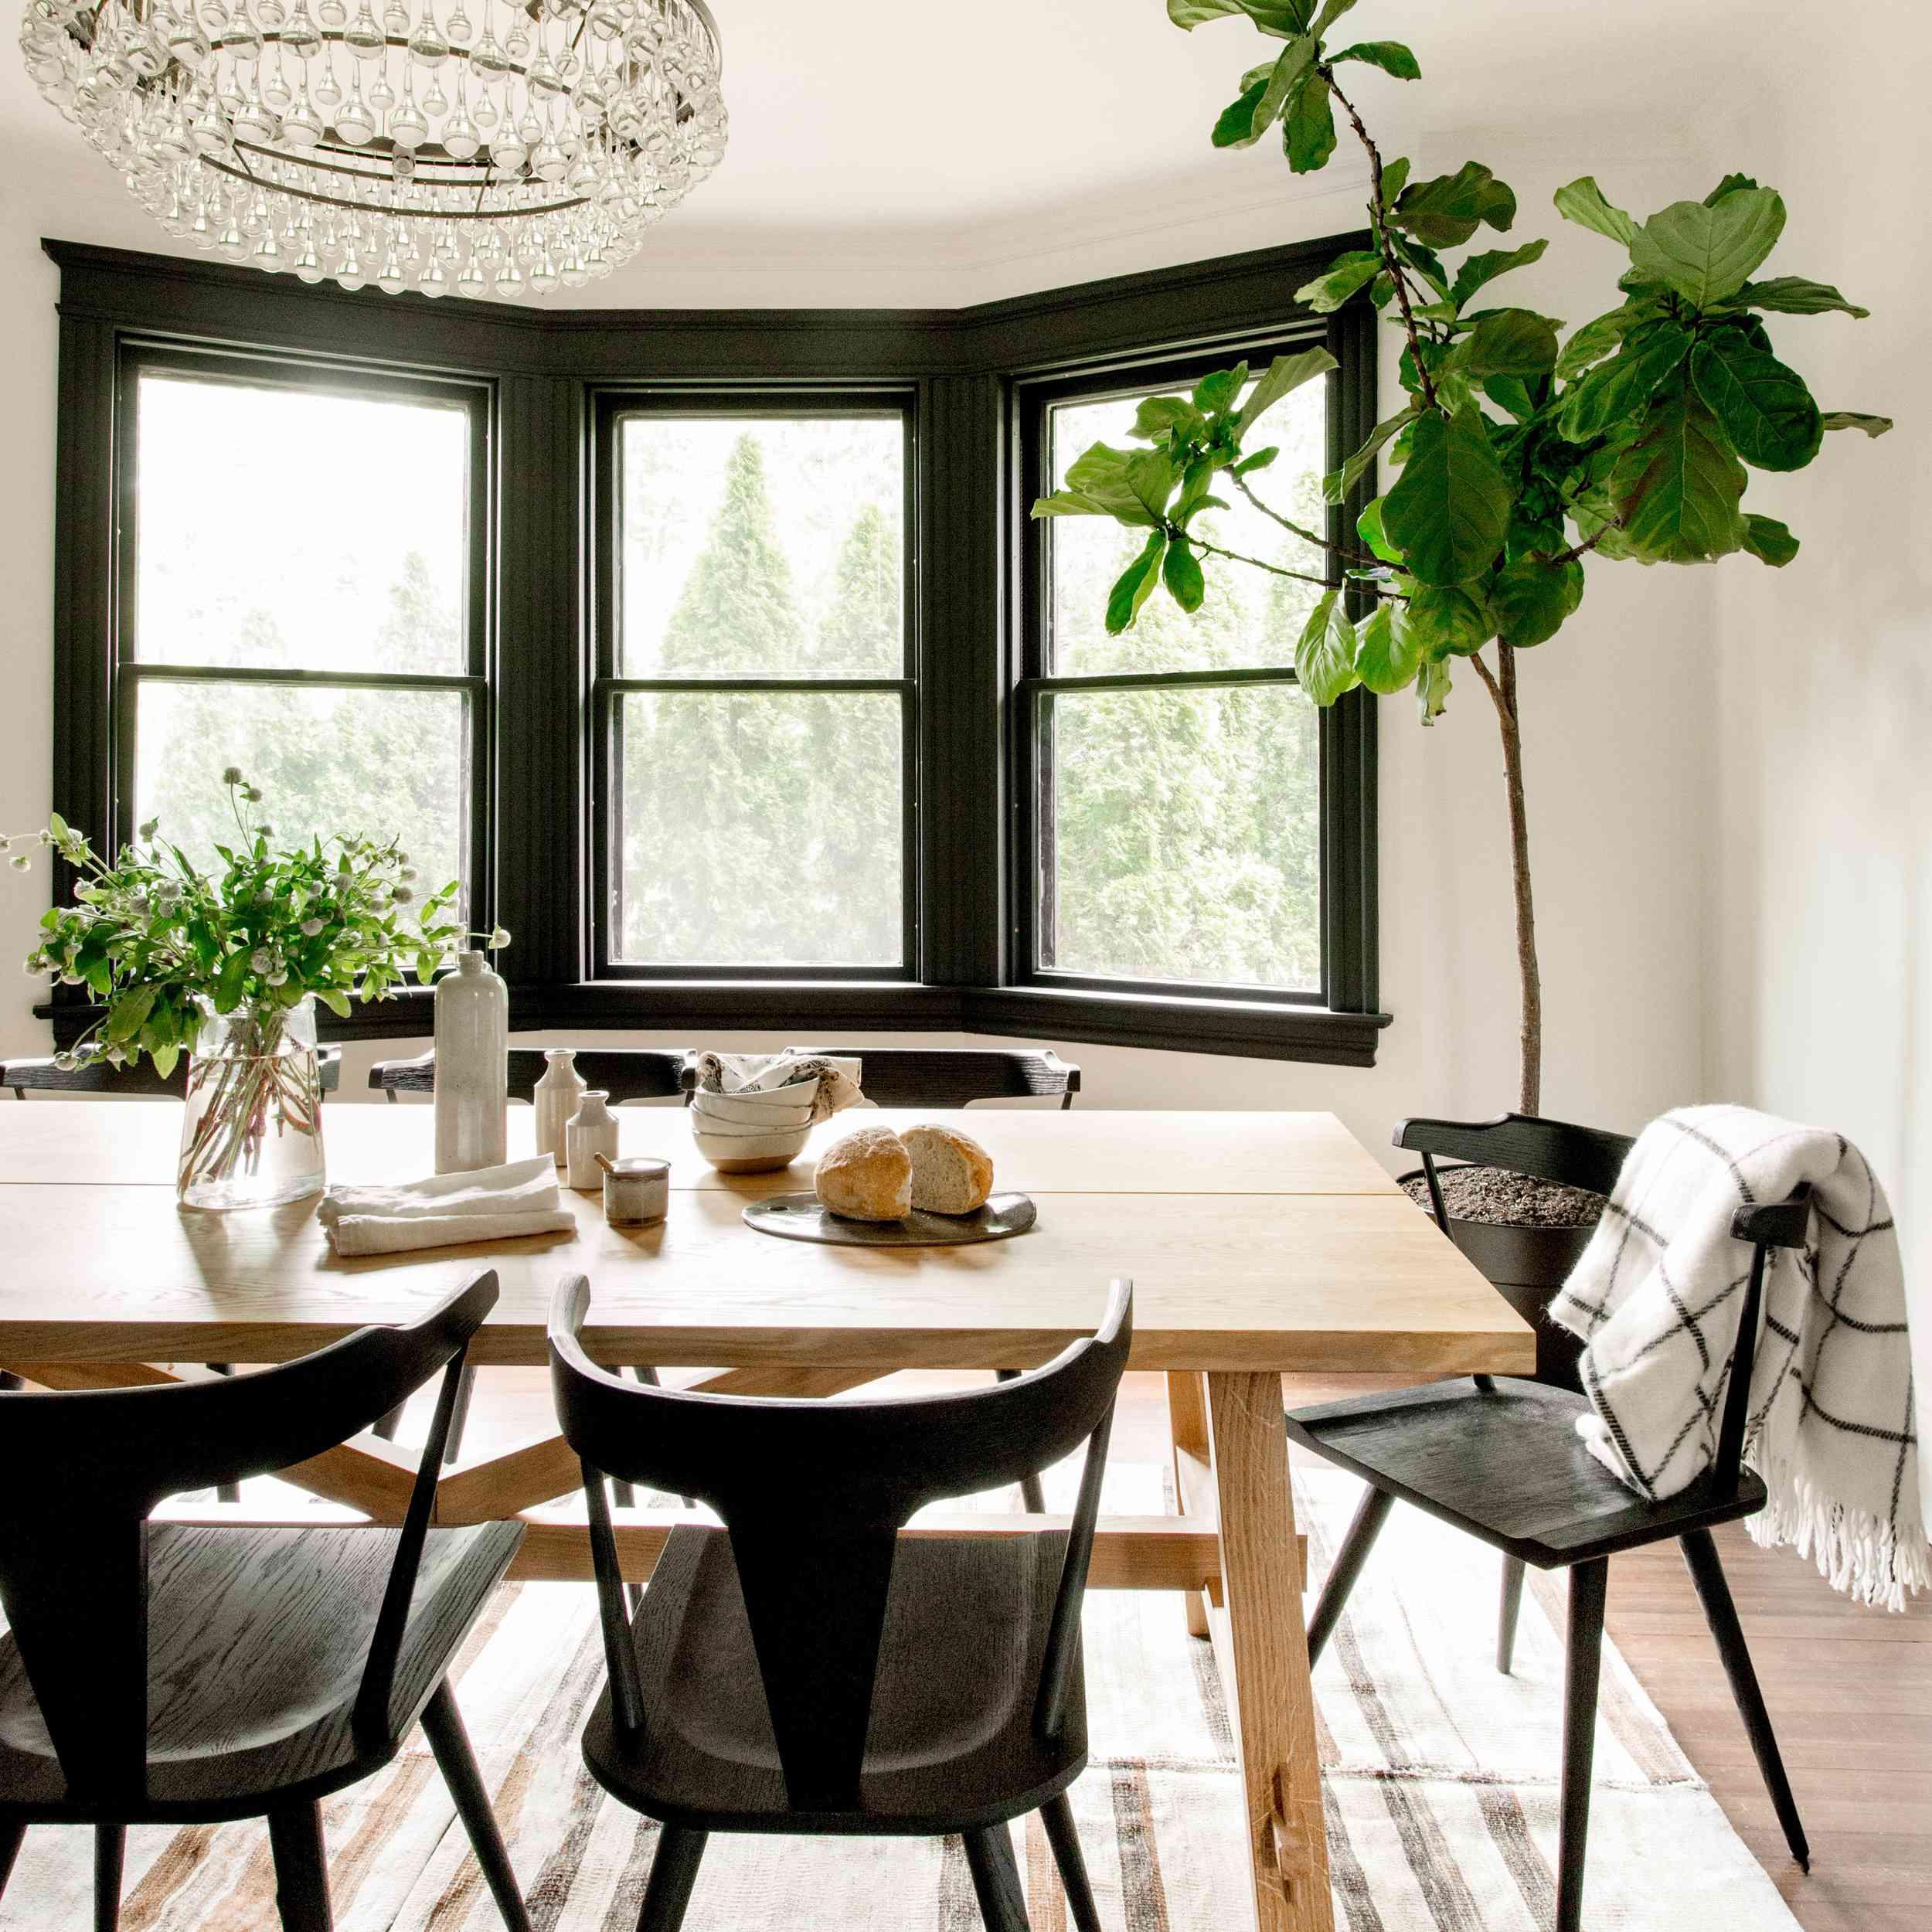 best window plants: fiddle-leaf fig